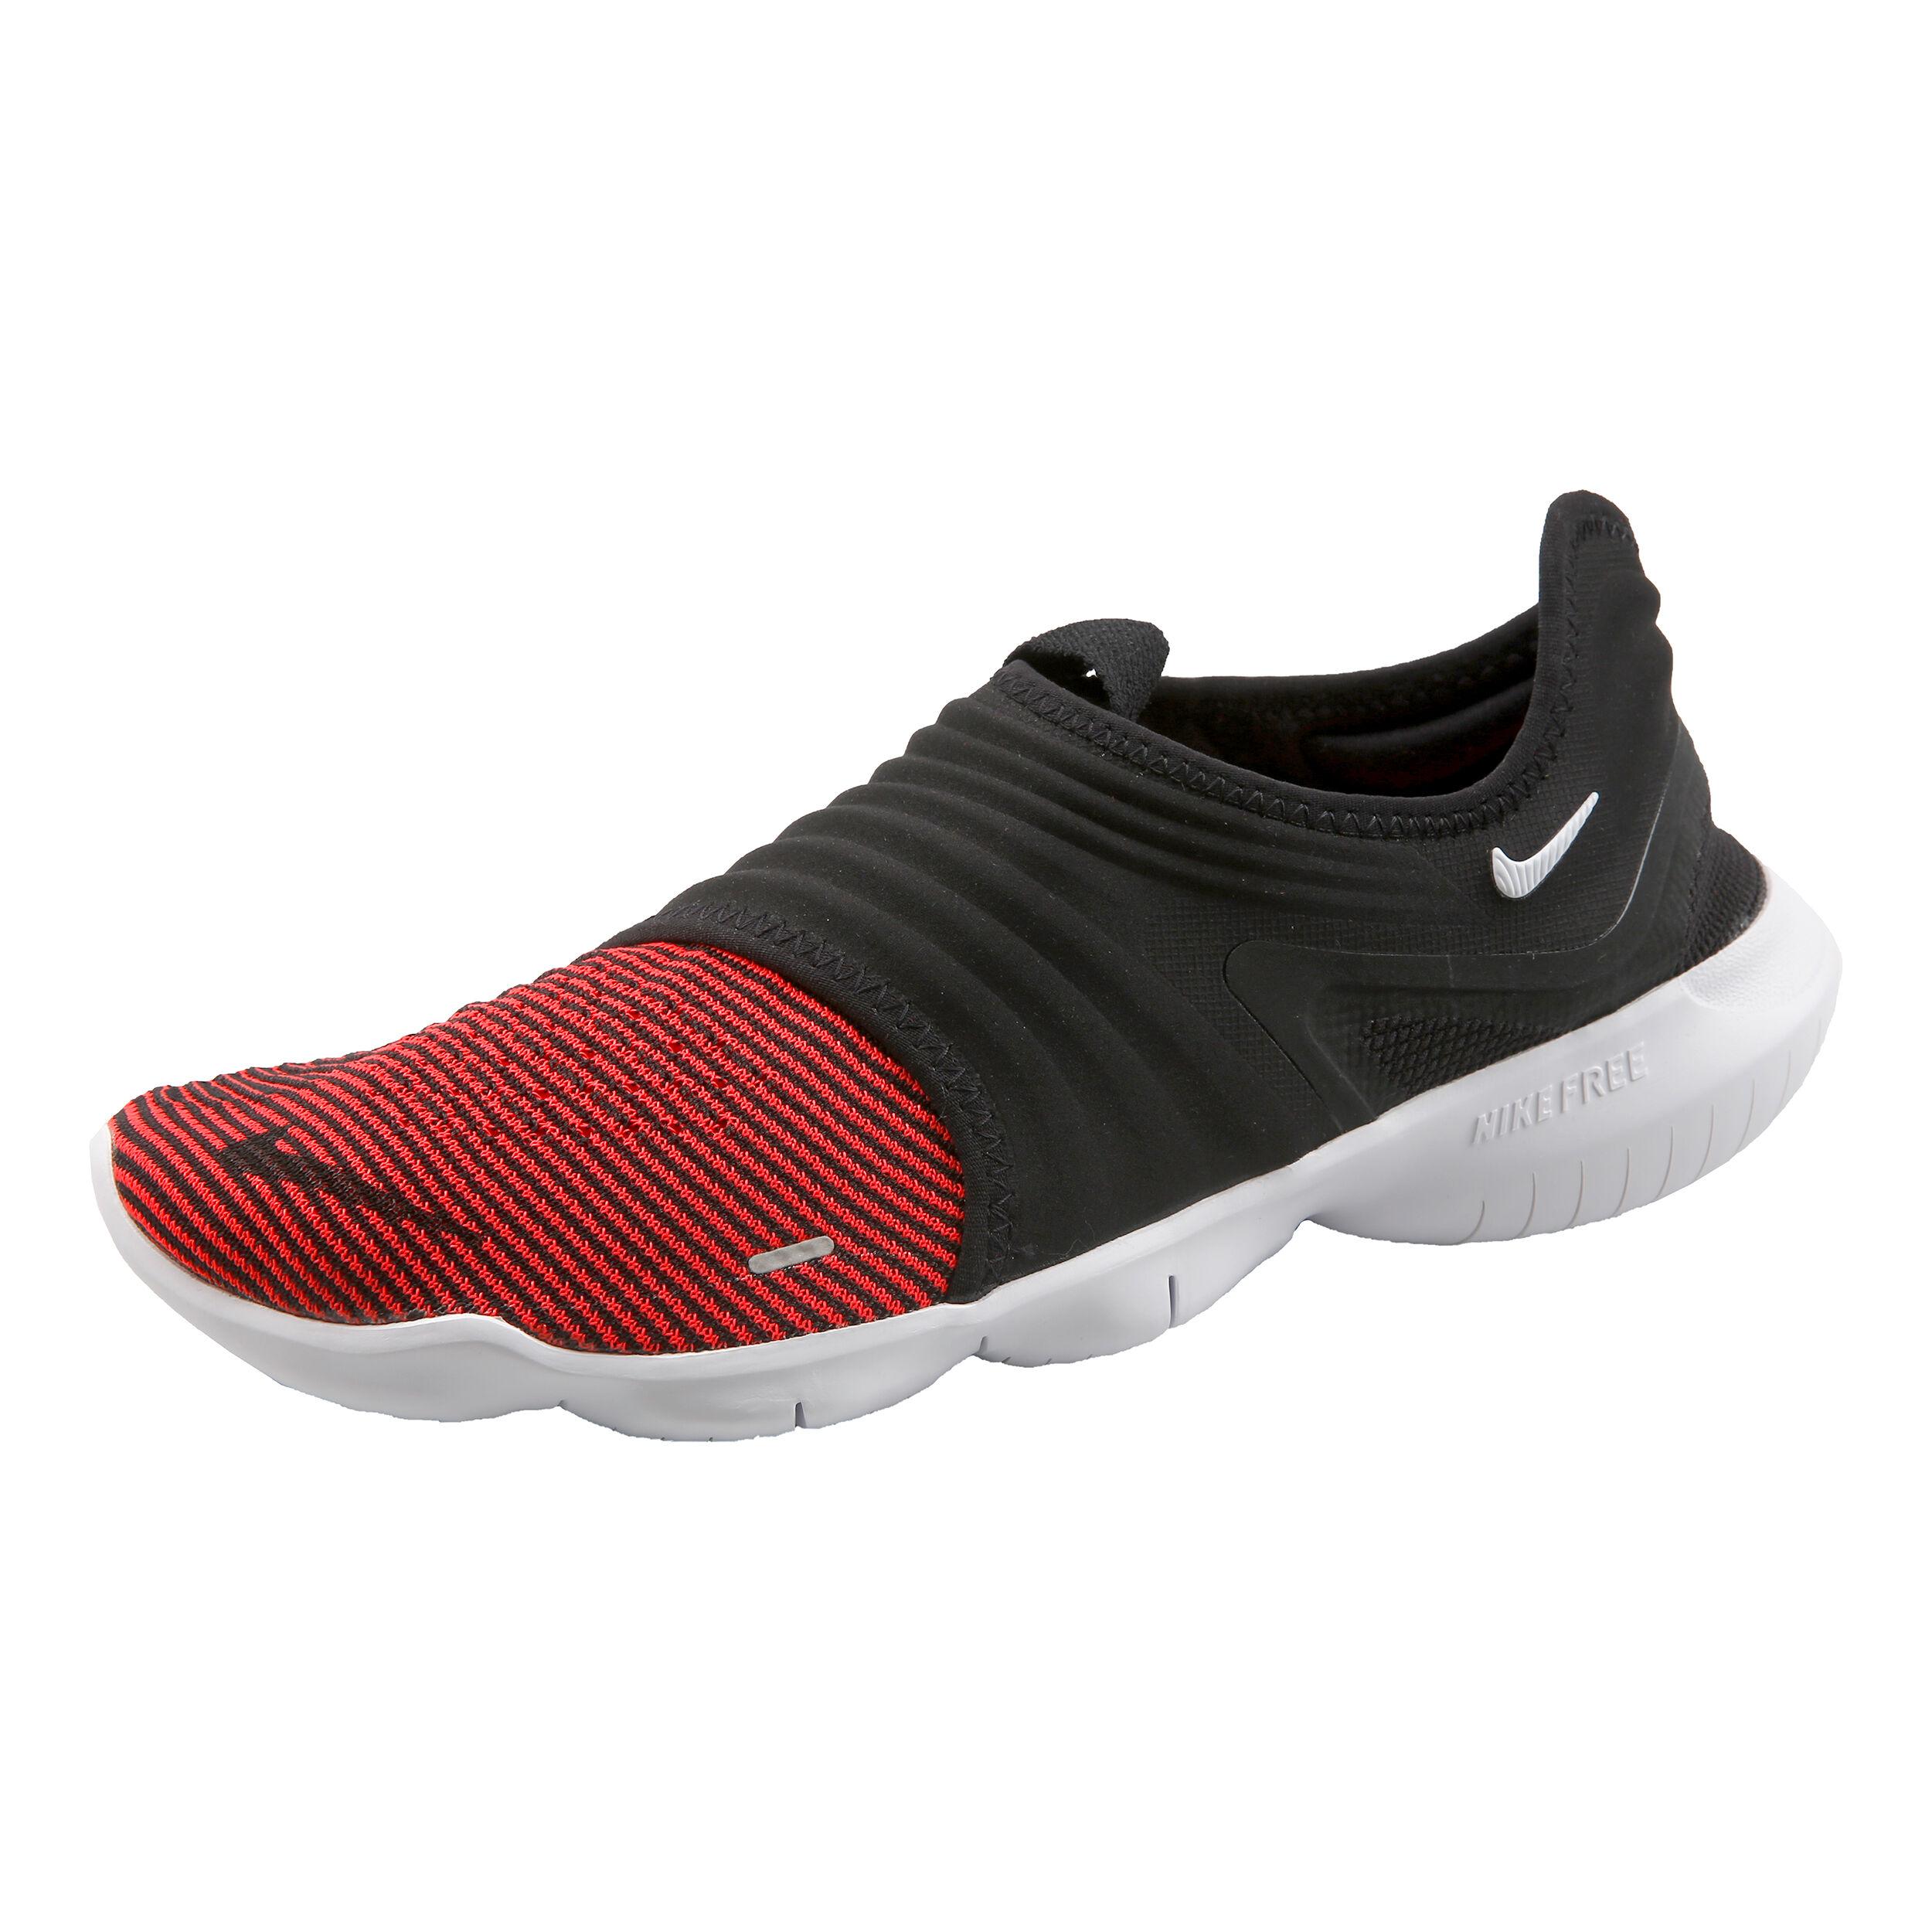 Nike Free Run Flyknit 3.0 Trainers Mens